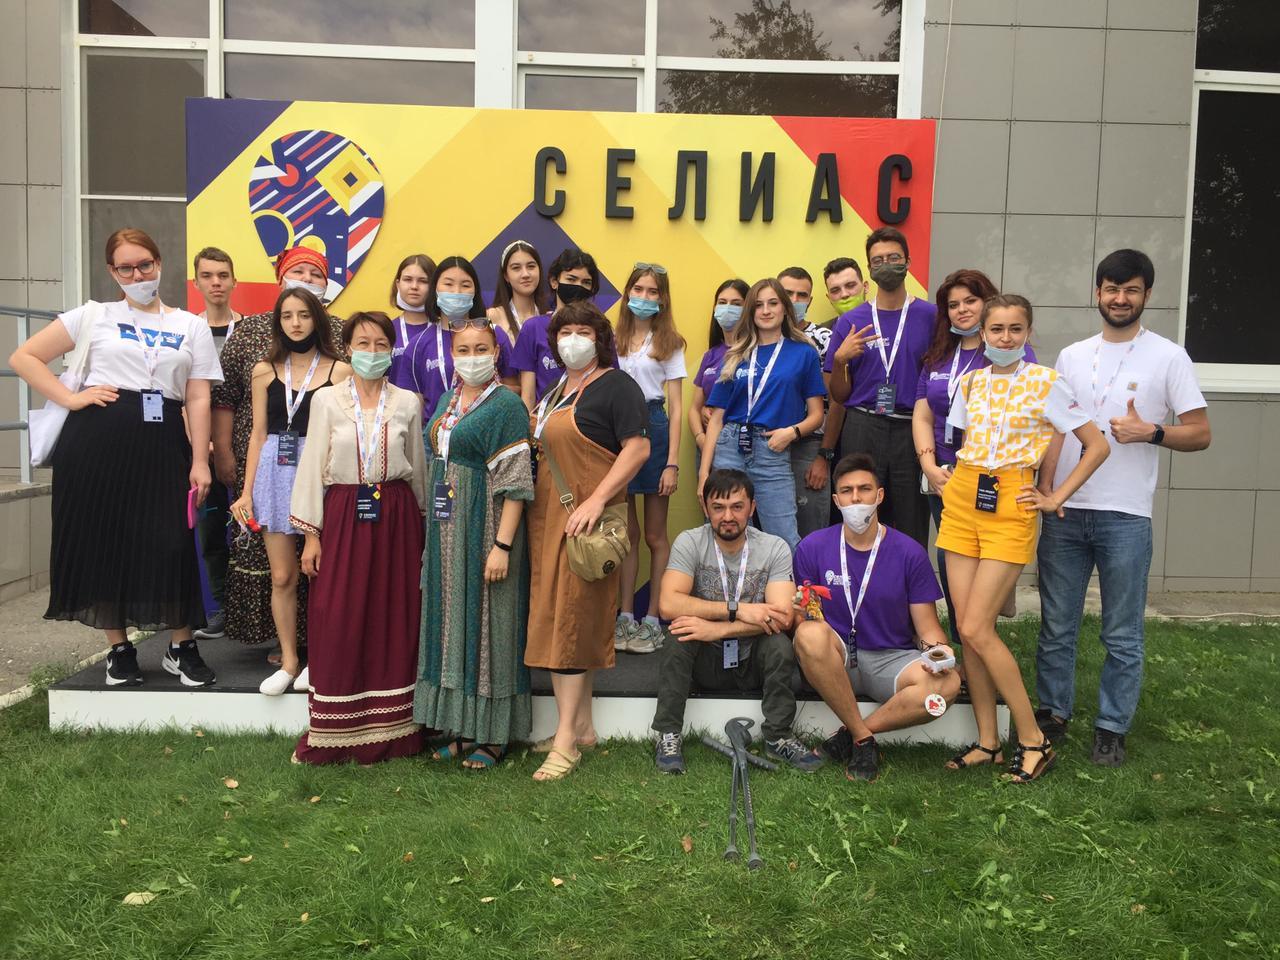 <strong>Мастера Дома ремесел – участники молодежного форума «Селиас-2021»</strong>